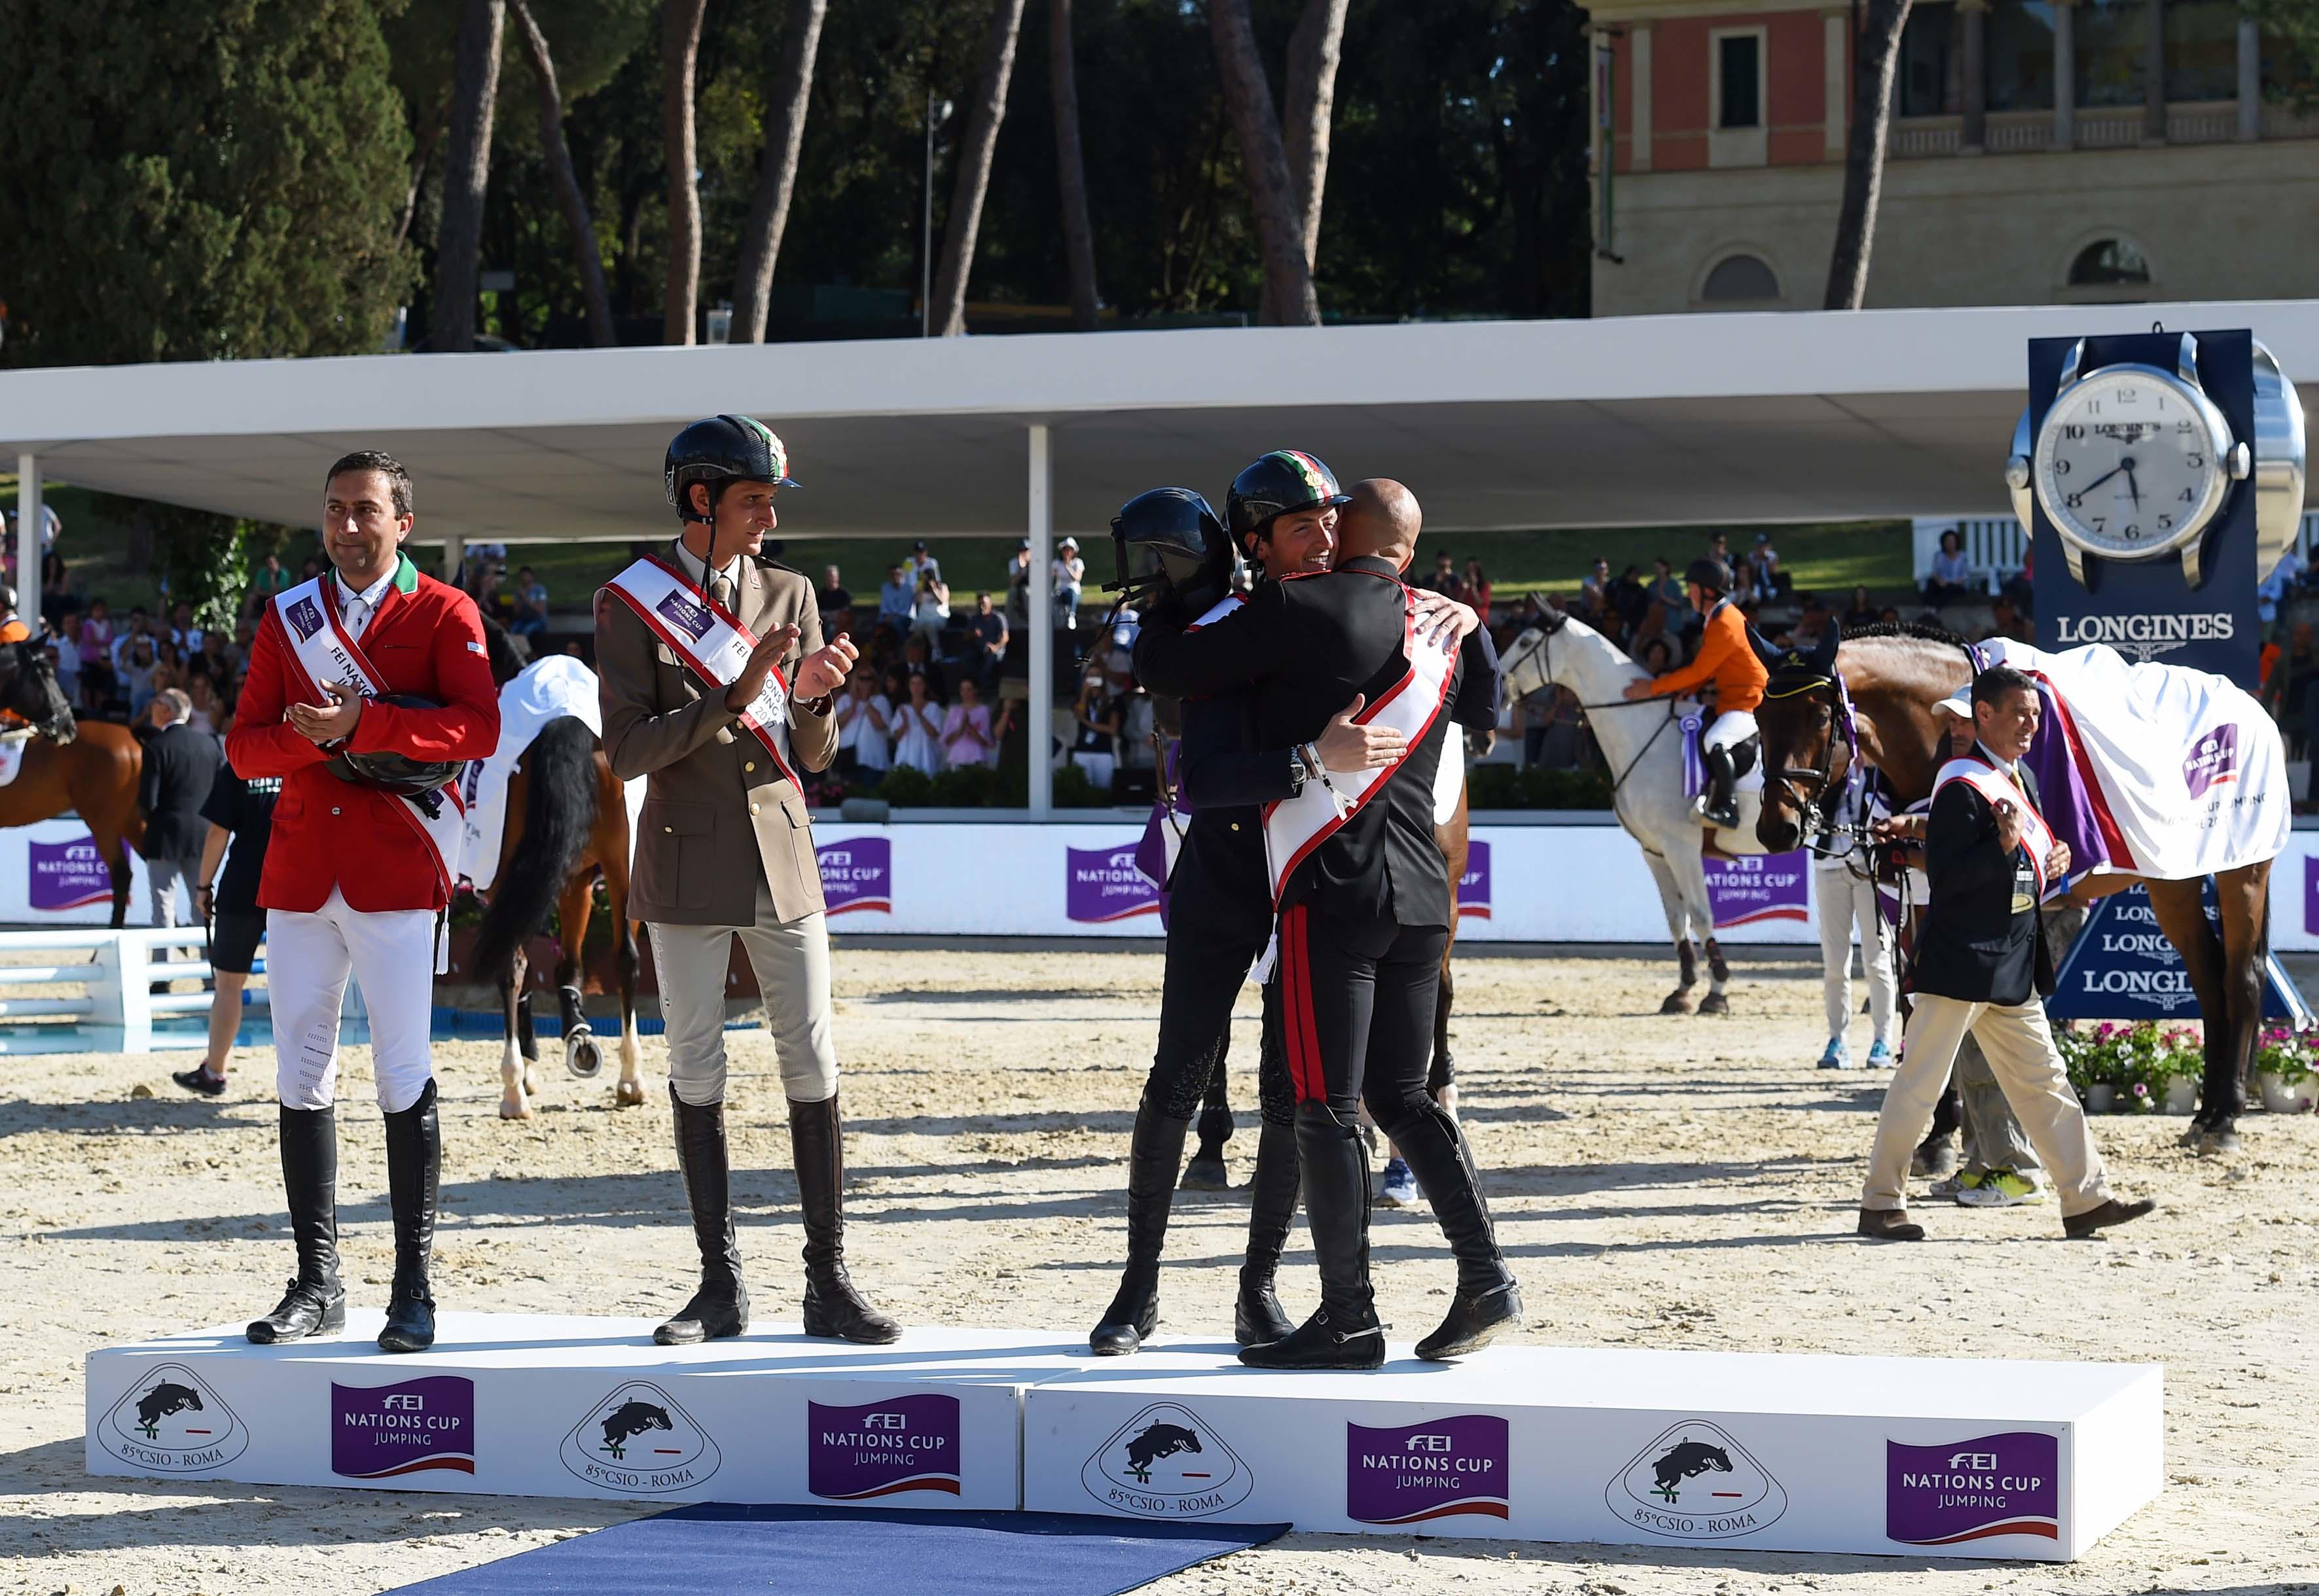 170526094 PiazzaDiSiena Foto Simone Ferraro - CONI